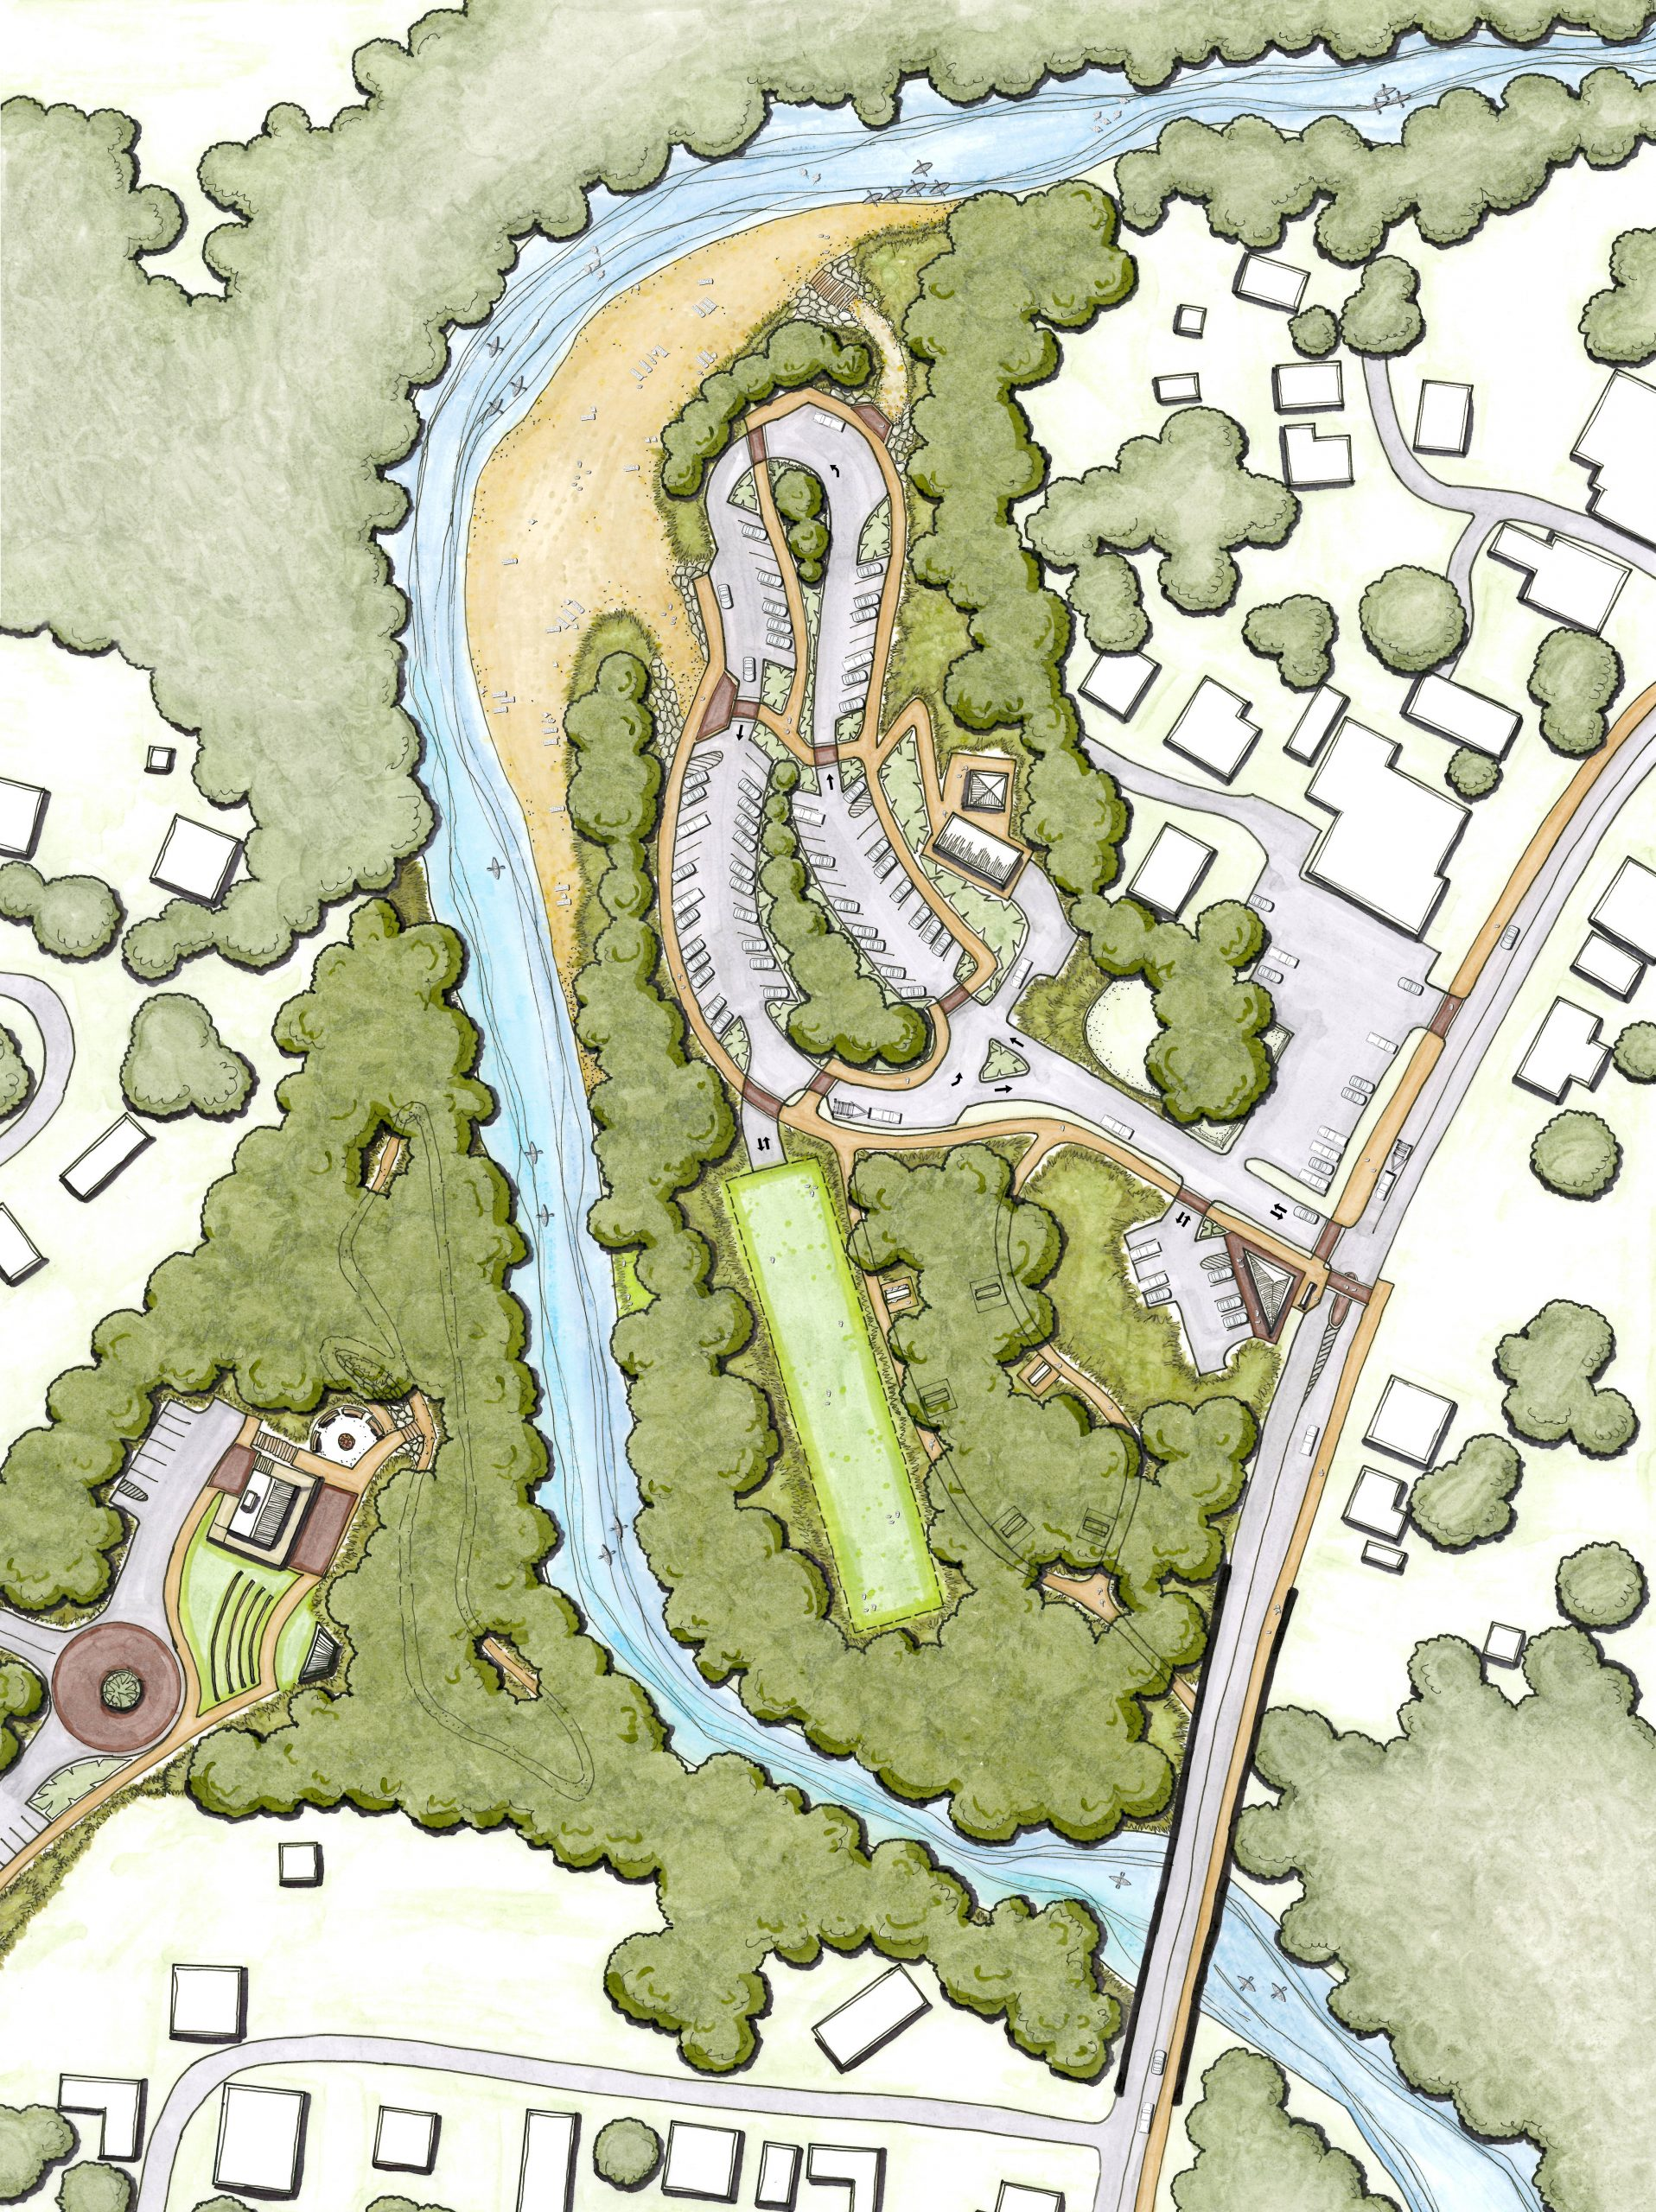 Greenway Planning